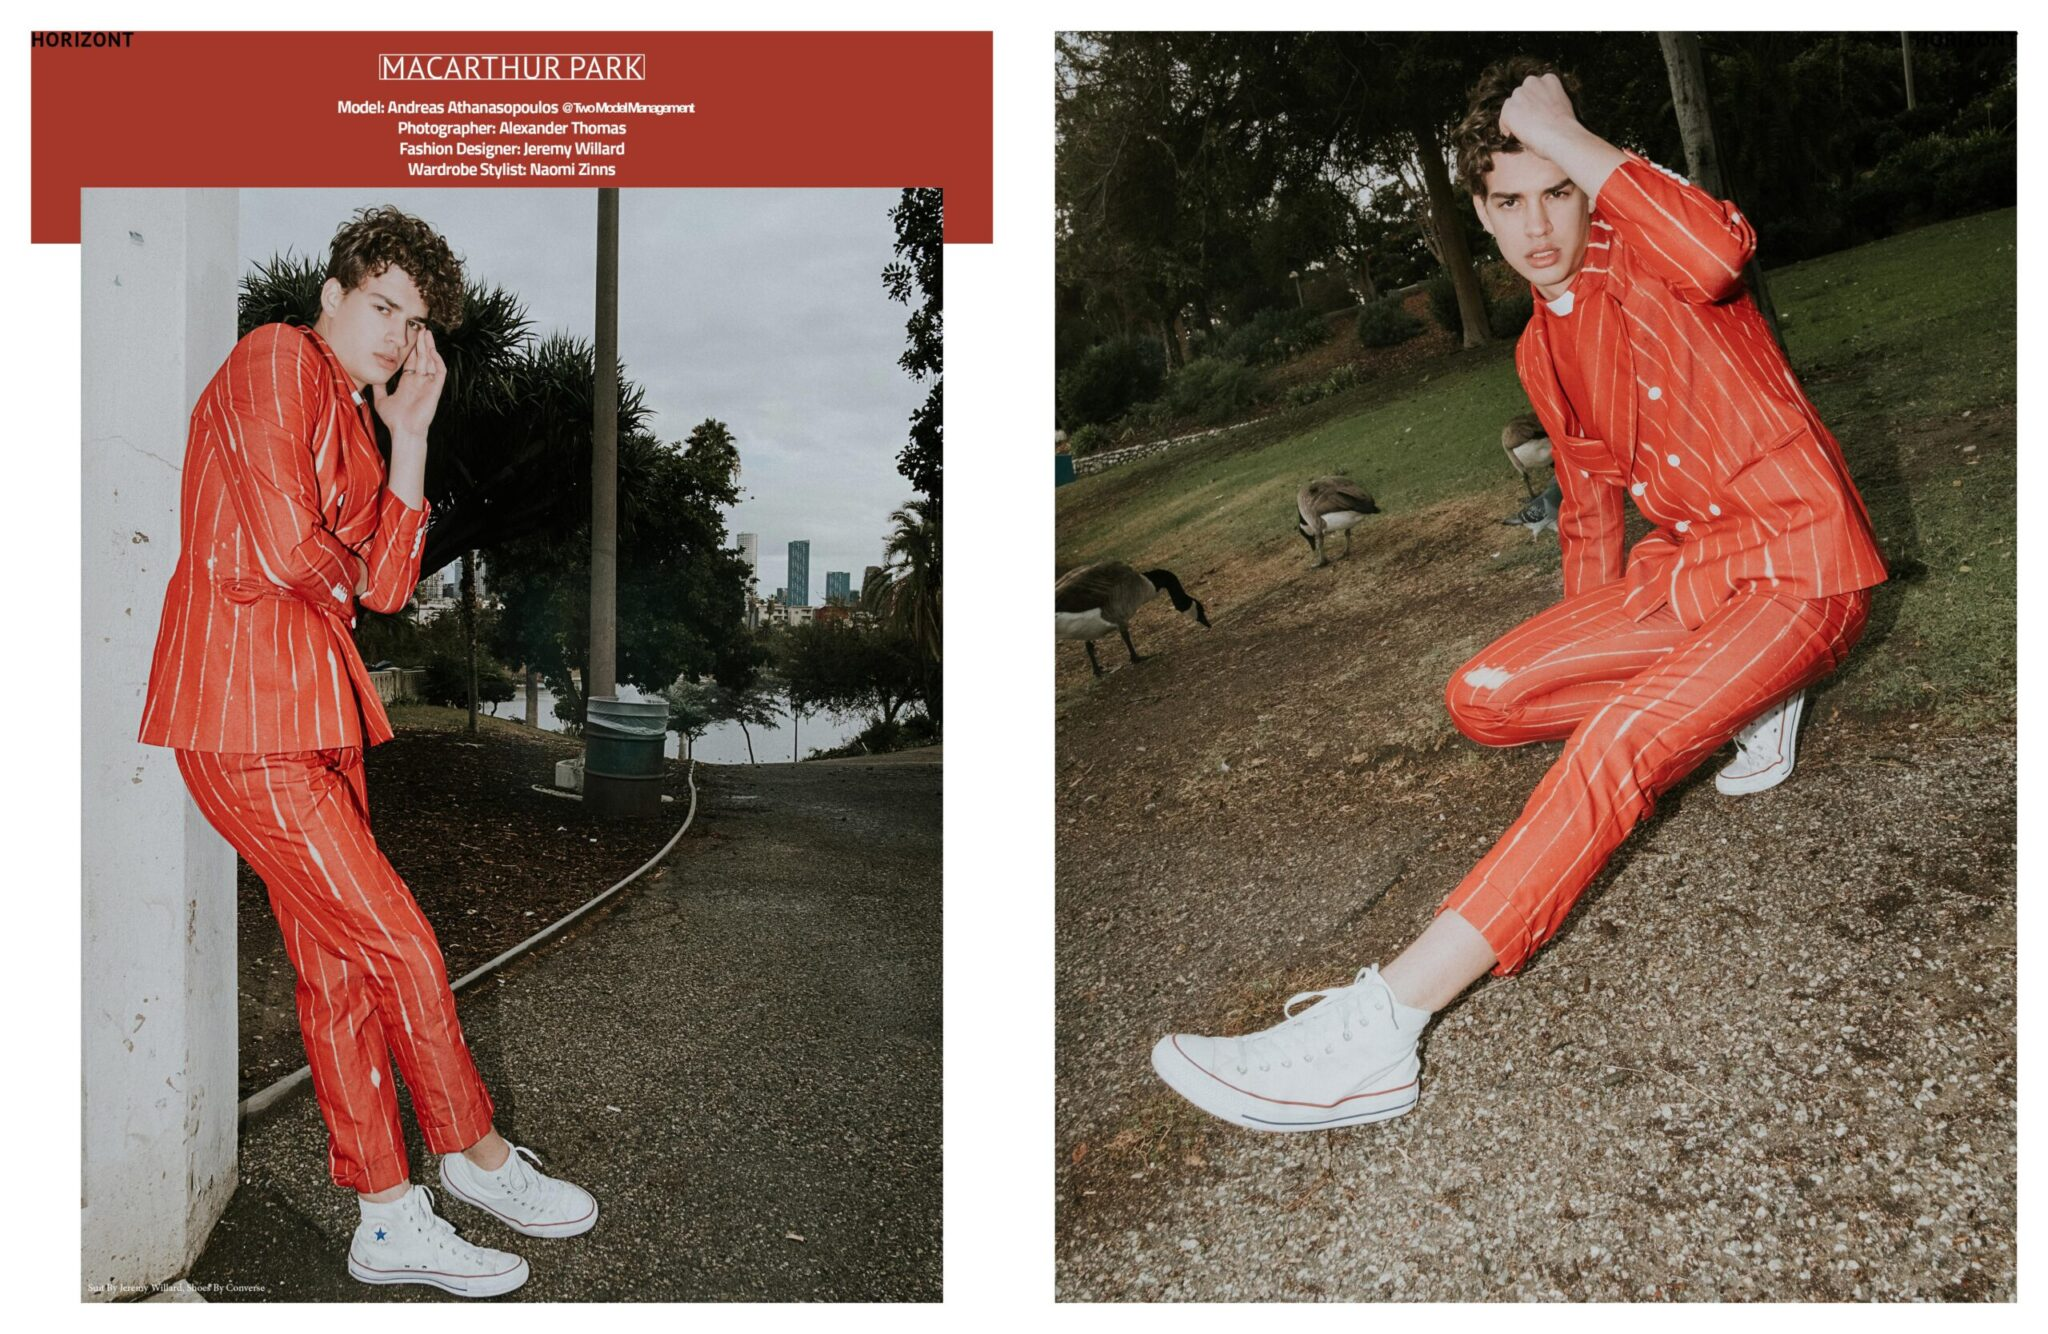 Macarthur Park (Horizont Magazine No. 7)